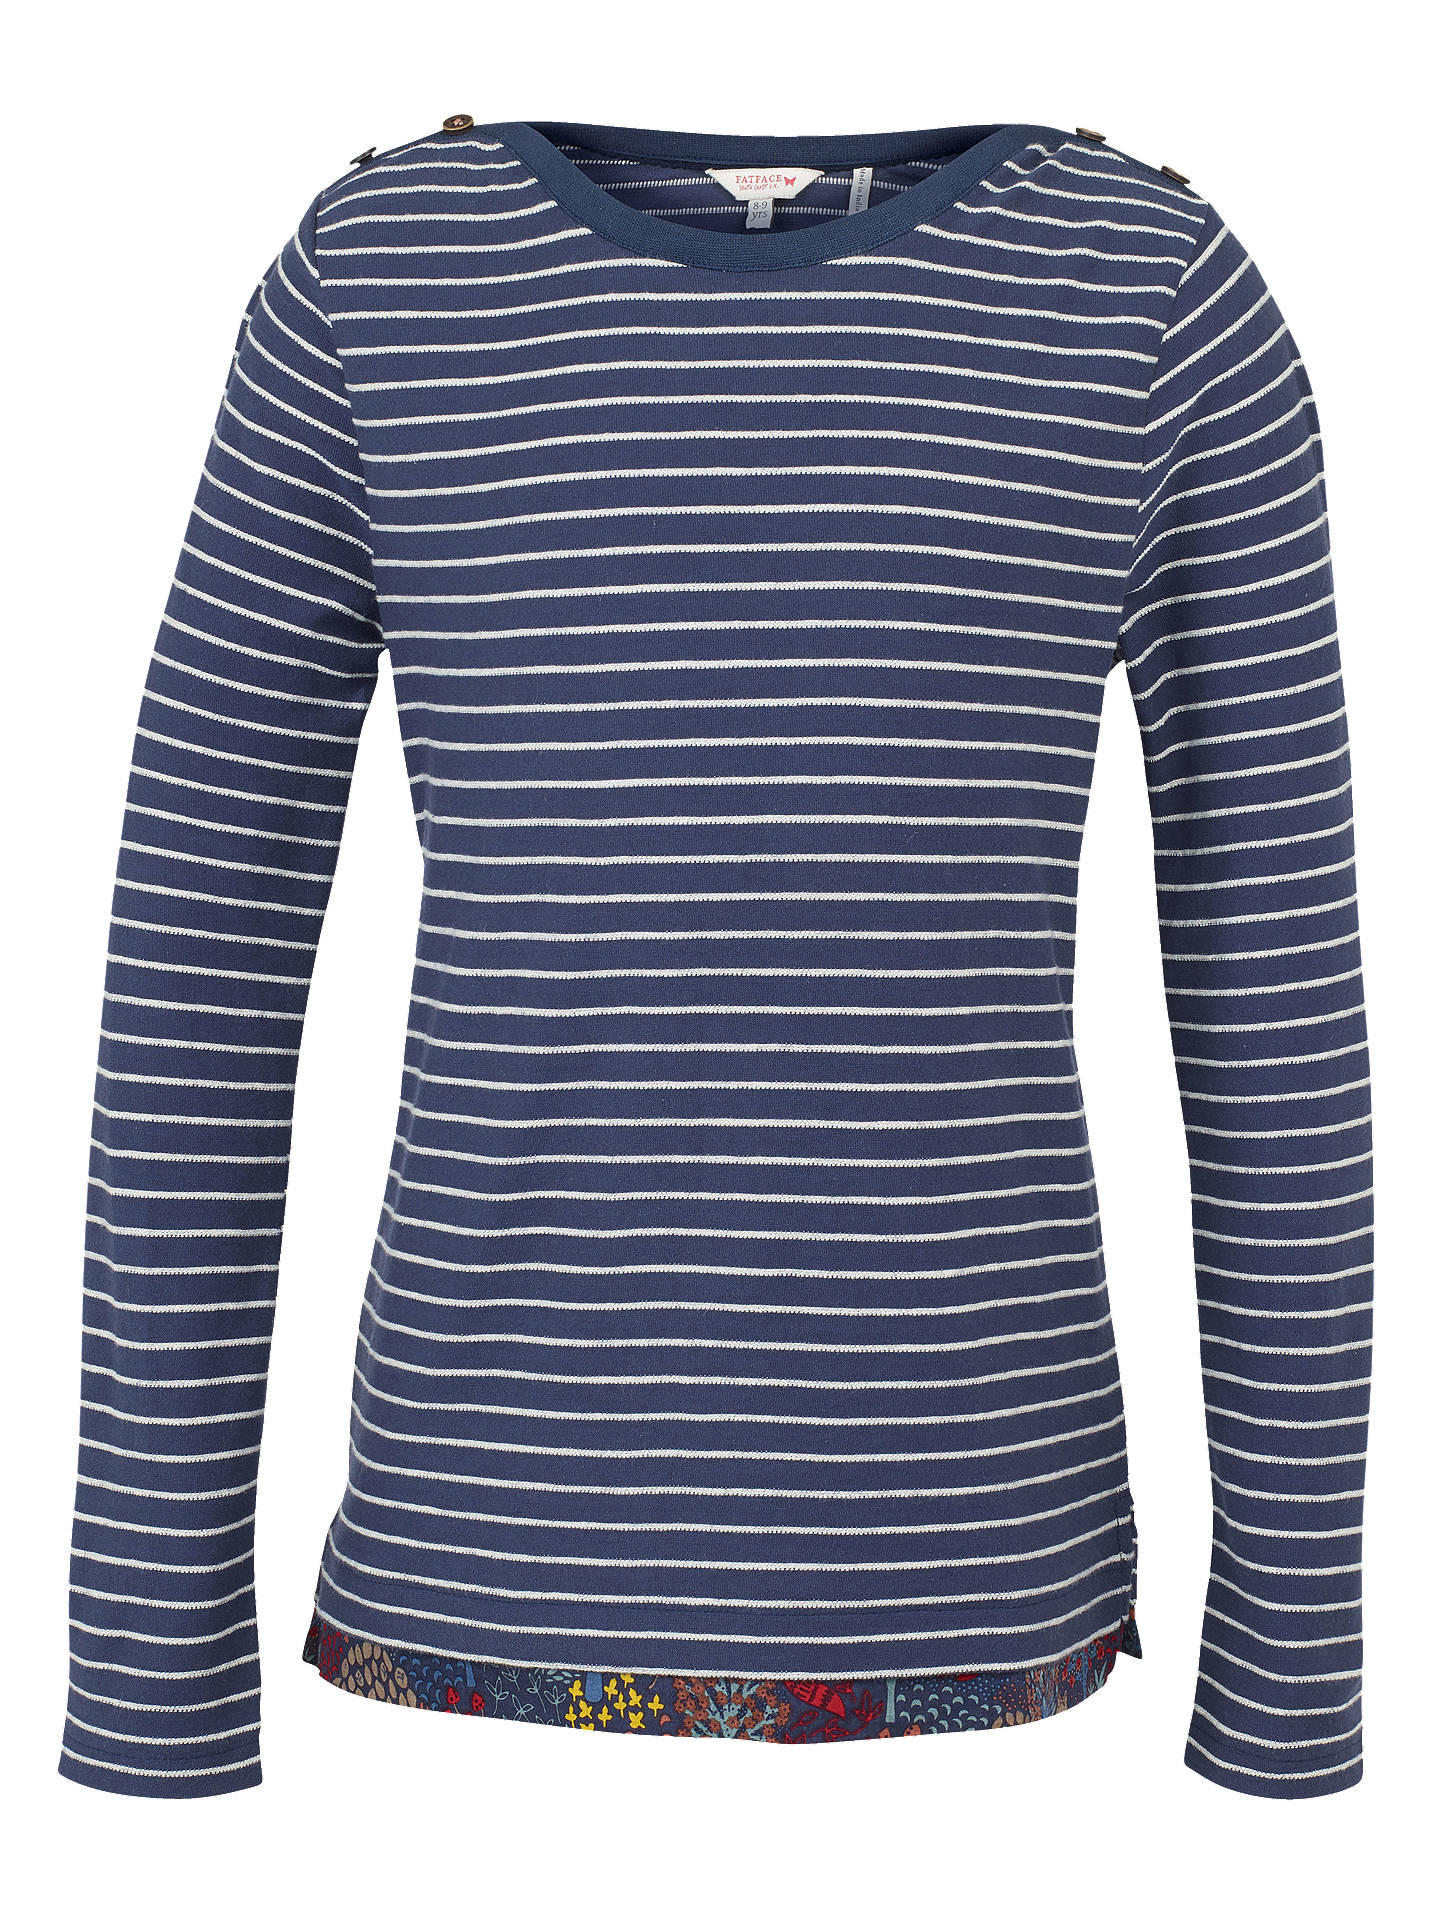 24a5db11eff BuyFat Face Girls  Long Sleeved Breton Striped T-Shirt